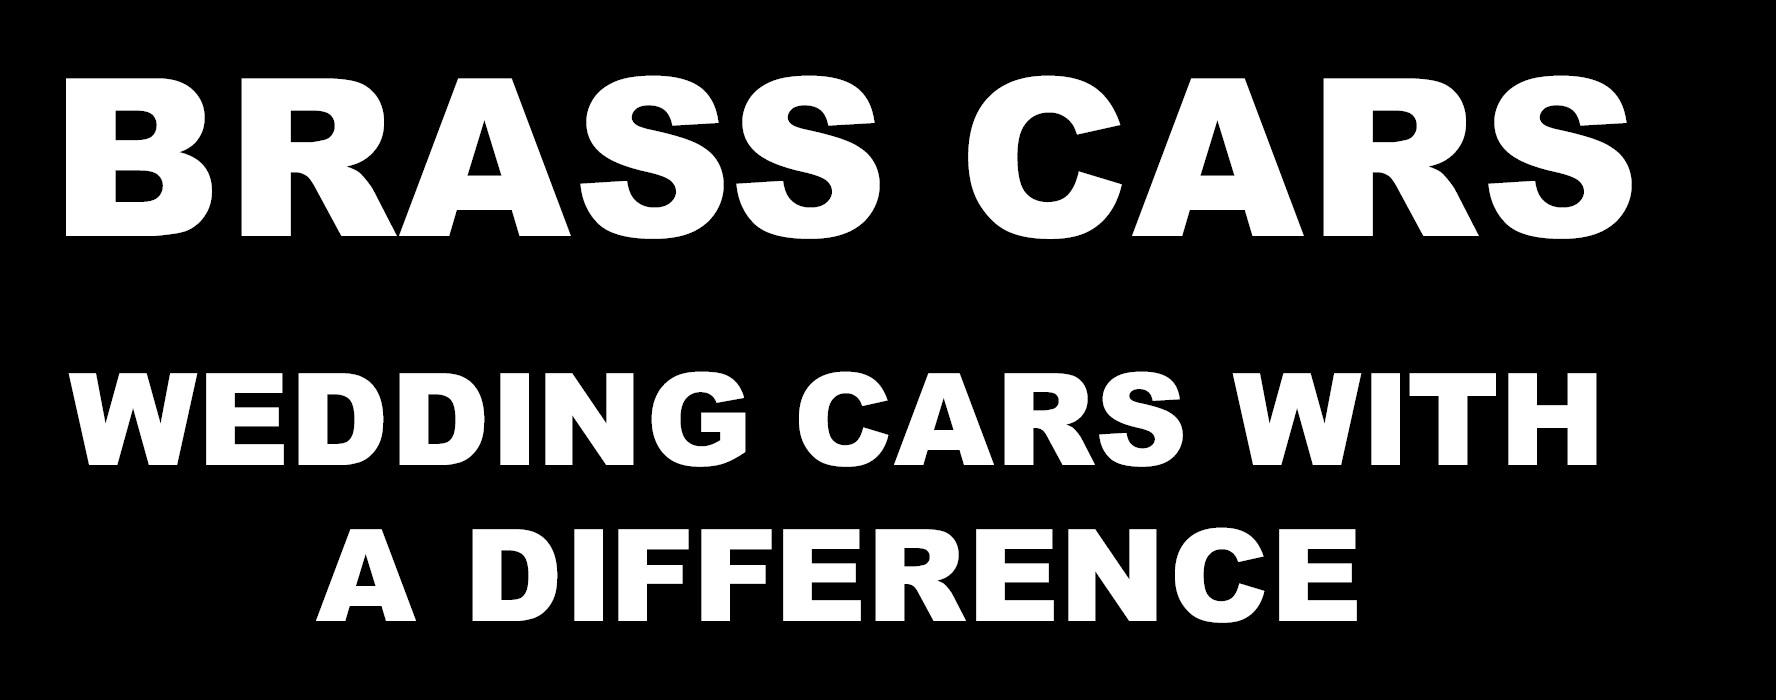 Brass Cars